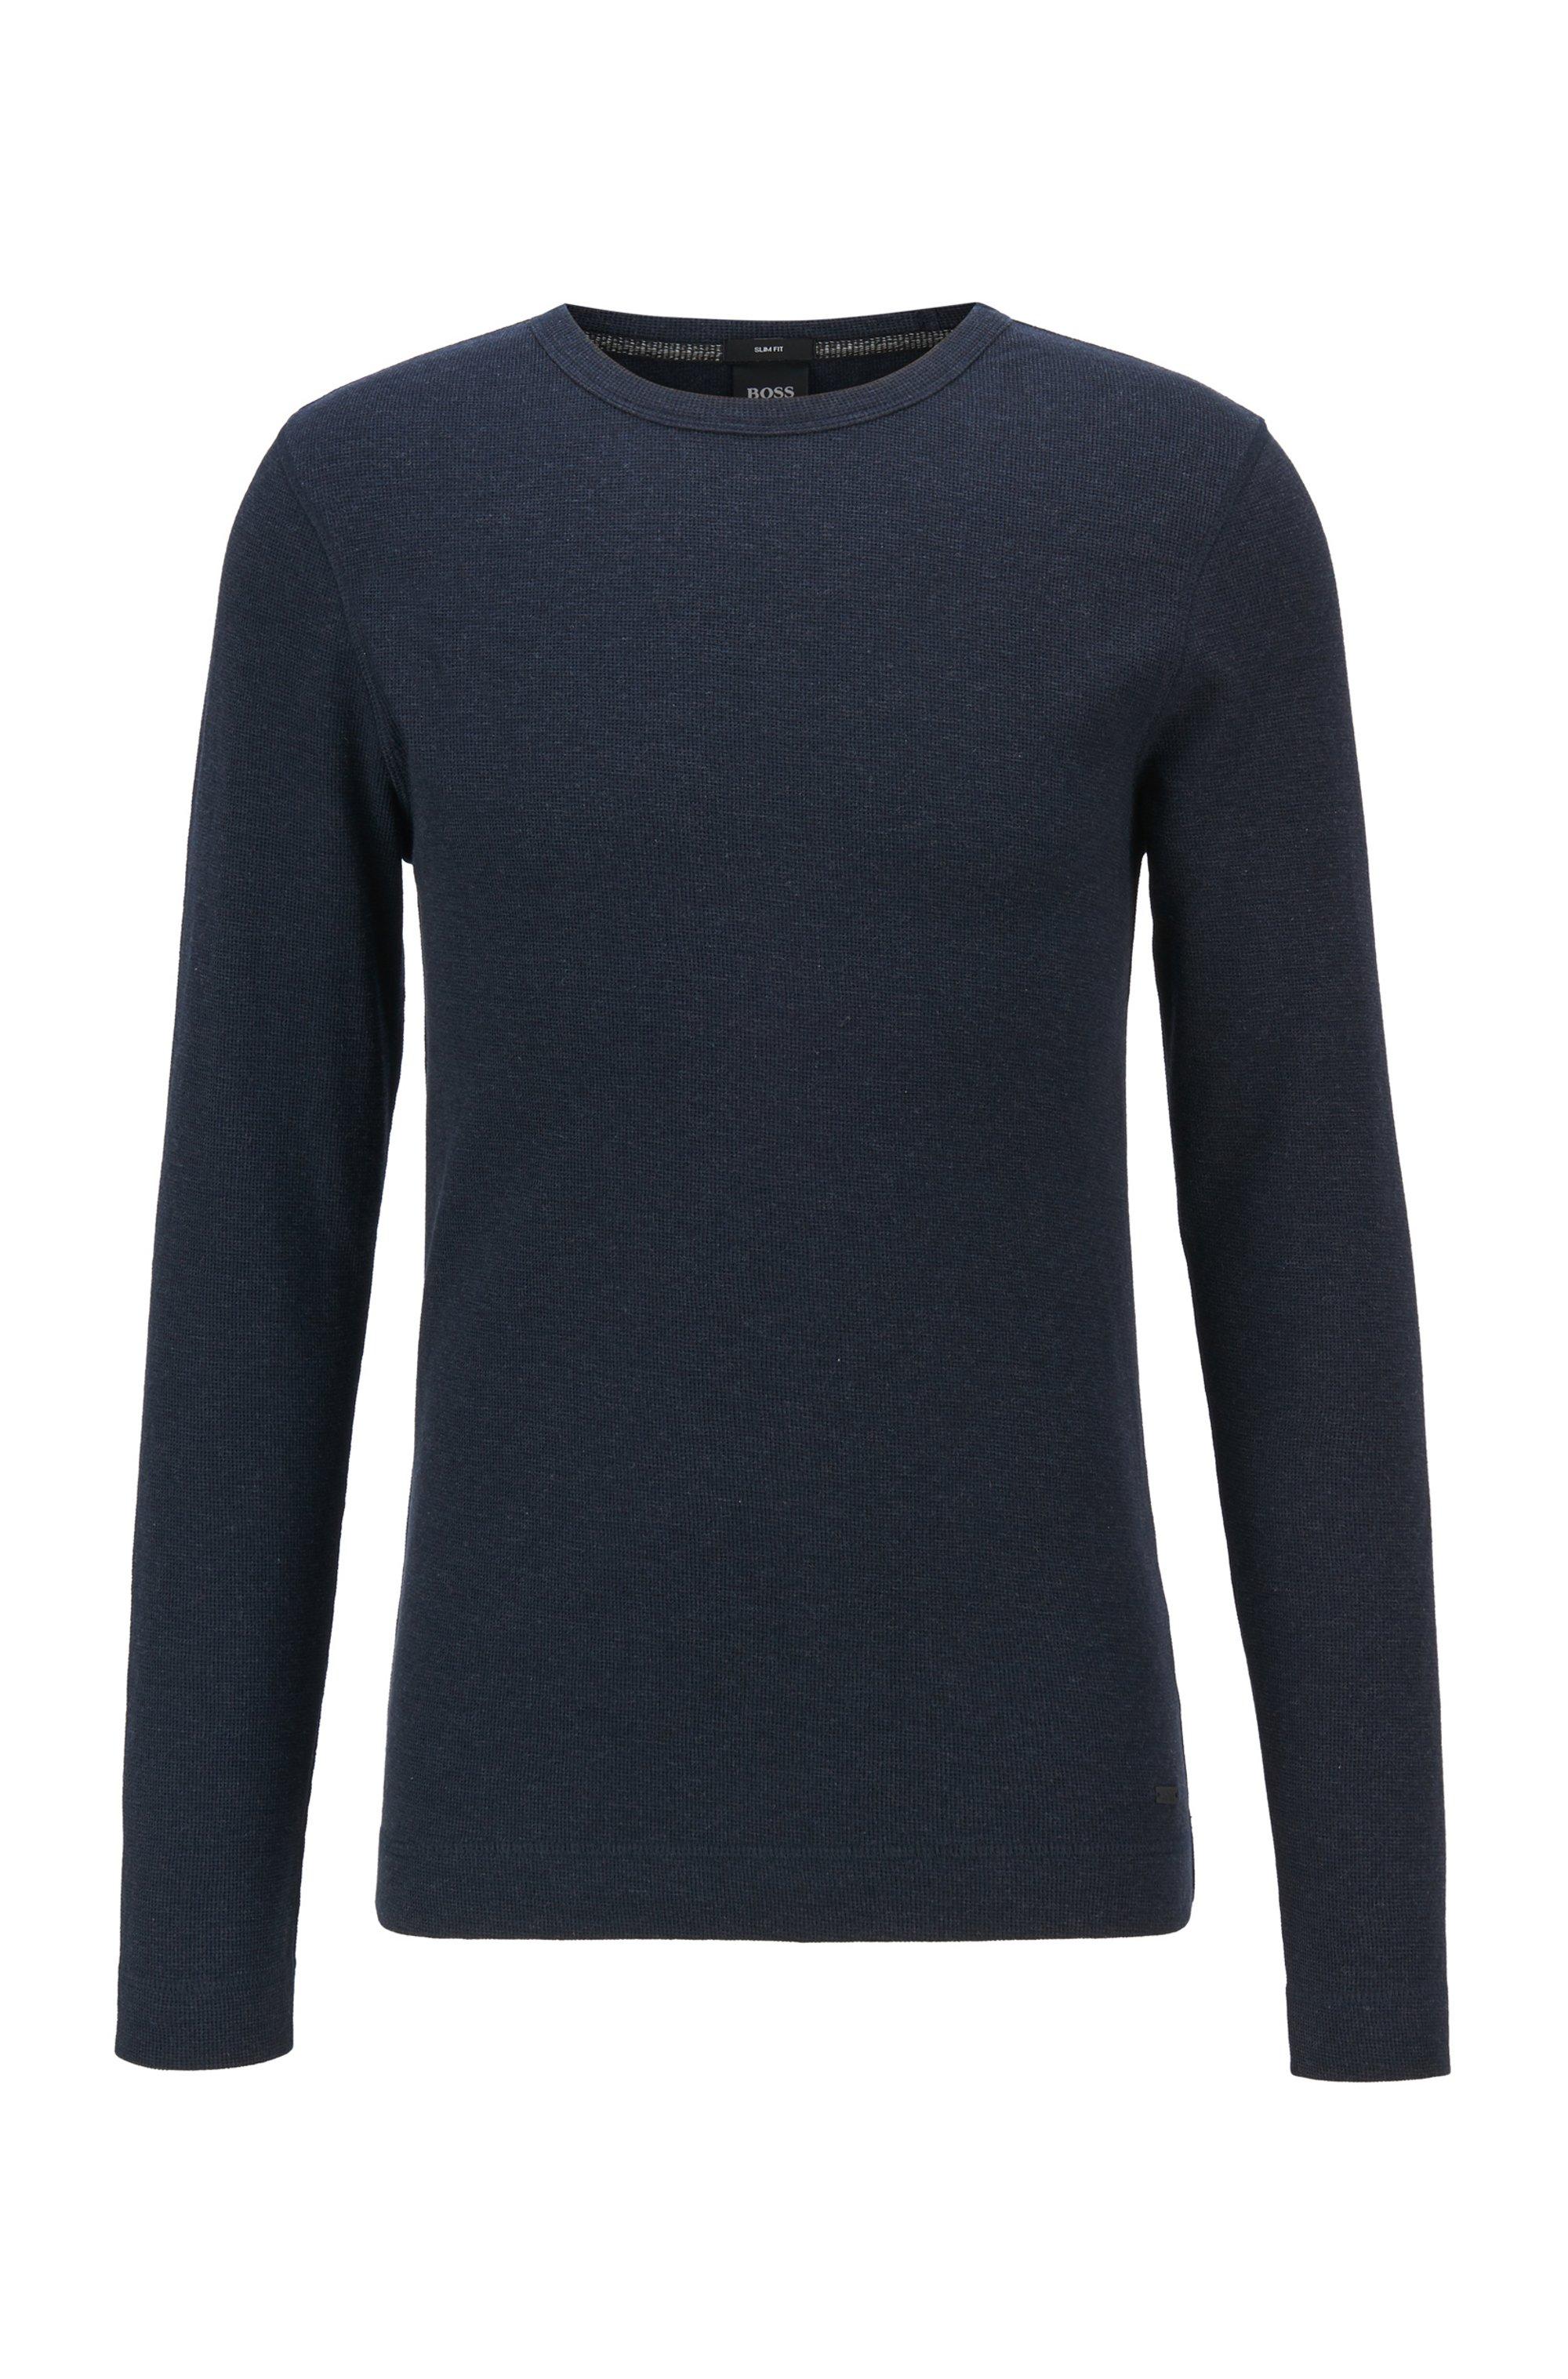 T-shirt slim fit a maniche lunghe in cotone con lavorazione a nido d'ape, Blu scuro